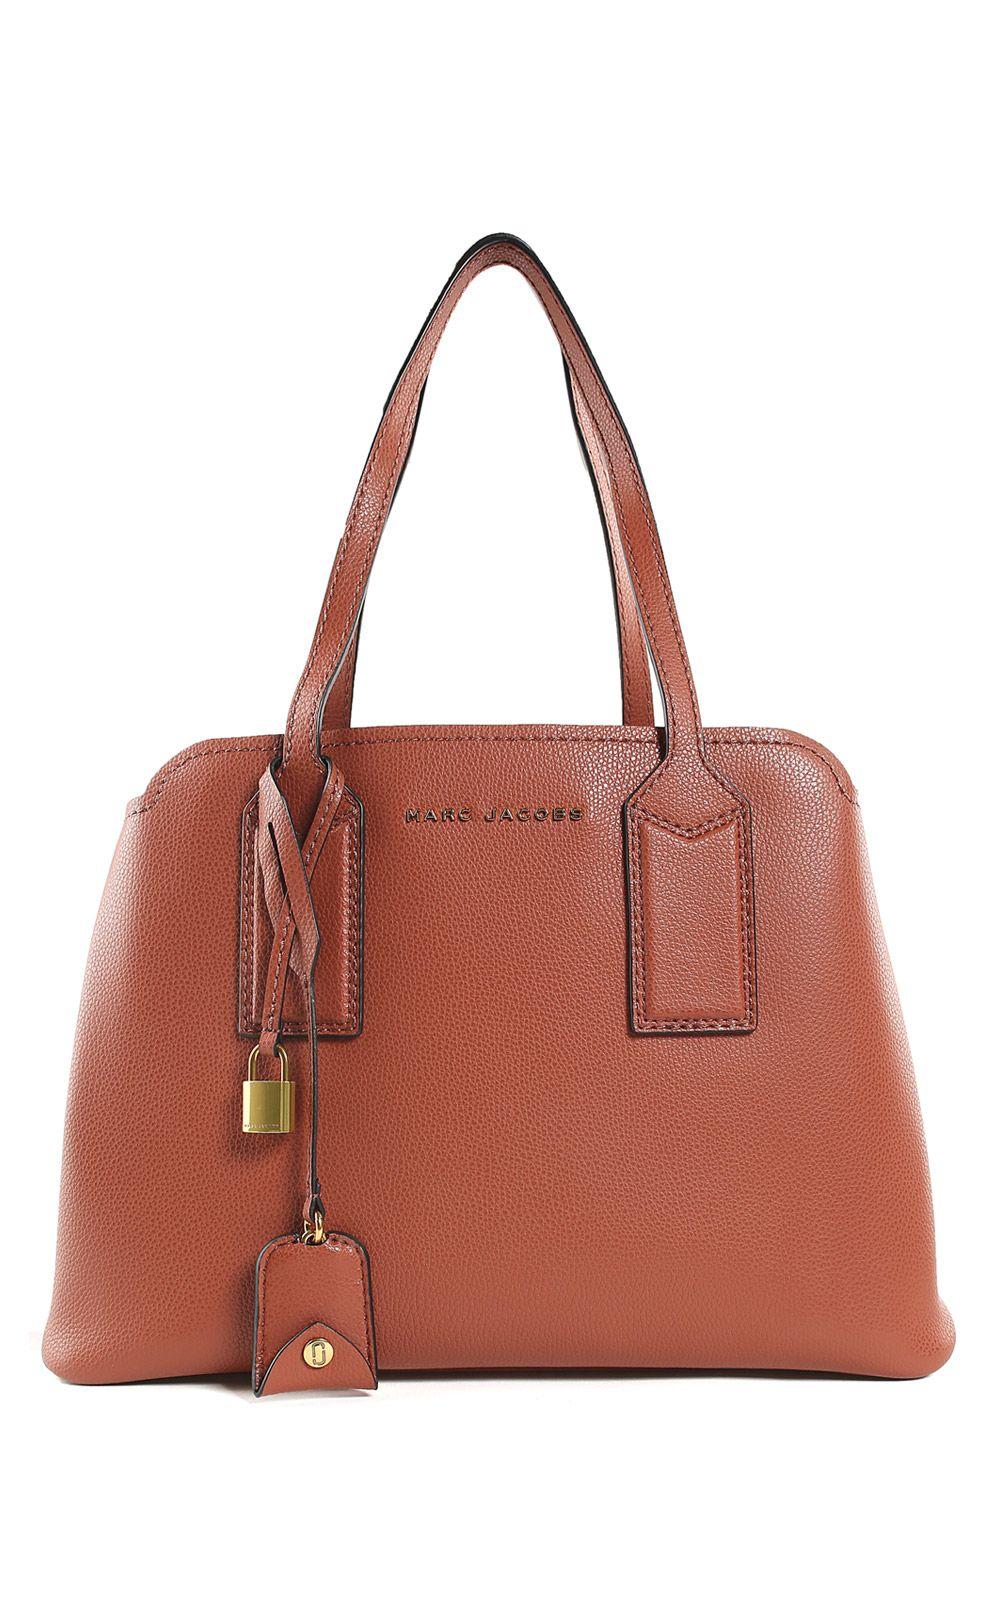 Marc Jacobs The Editor Leather Shoulder Bag